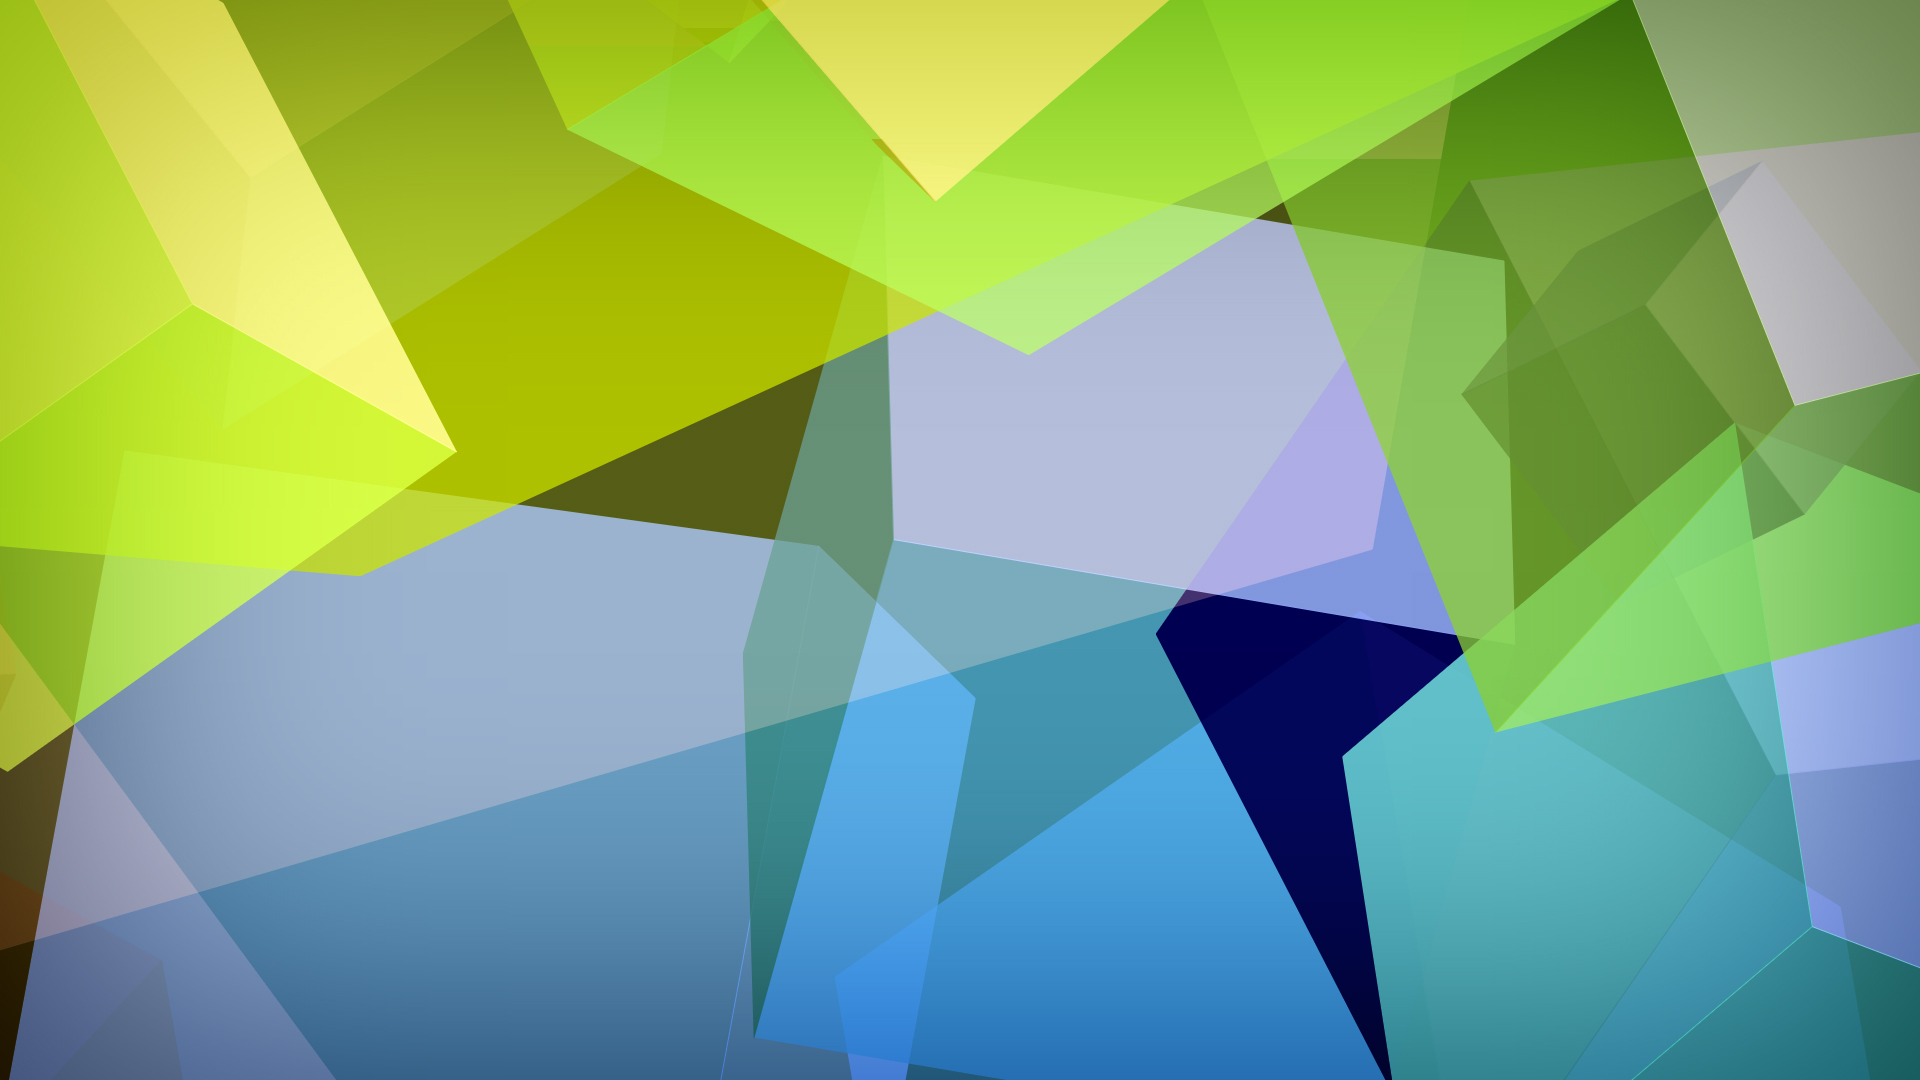 47 Geometric Shapes Wallpaper On Wallpapersafari